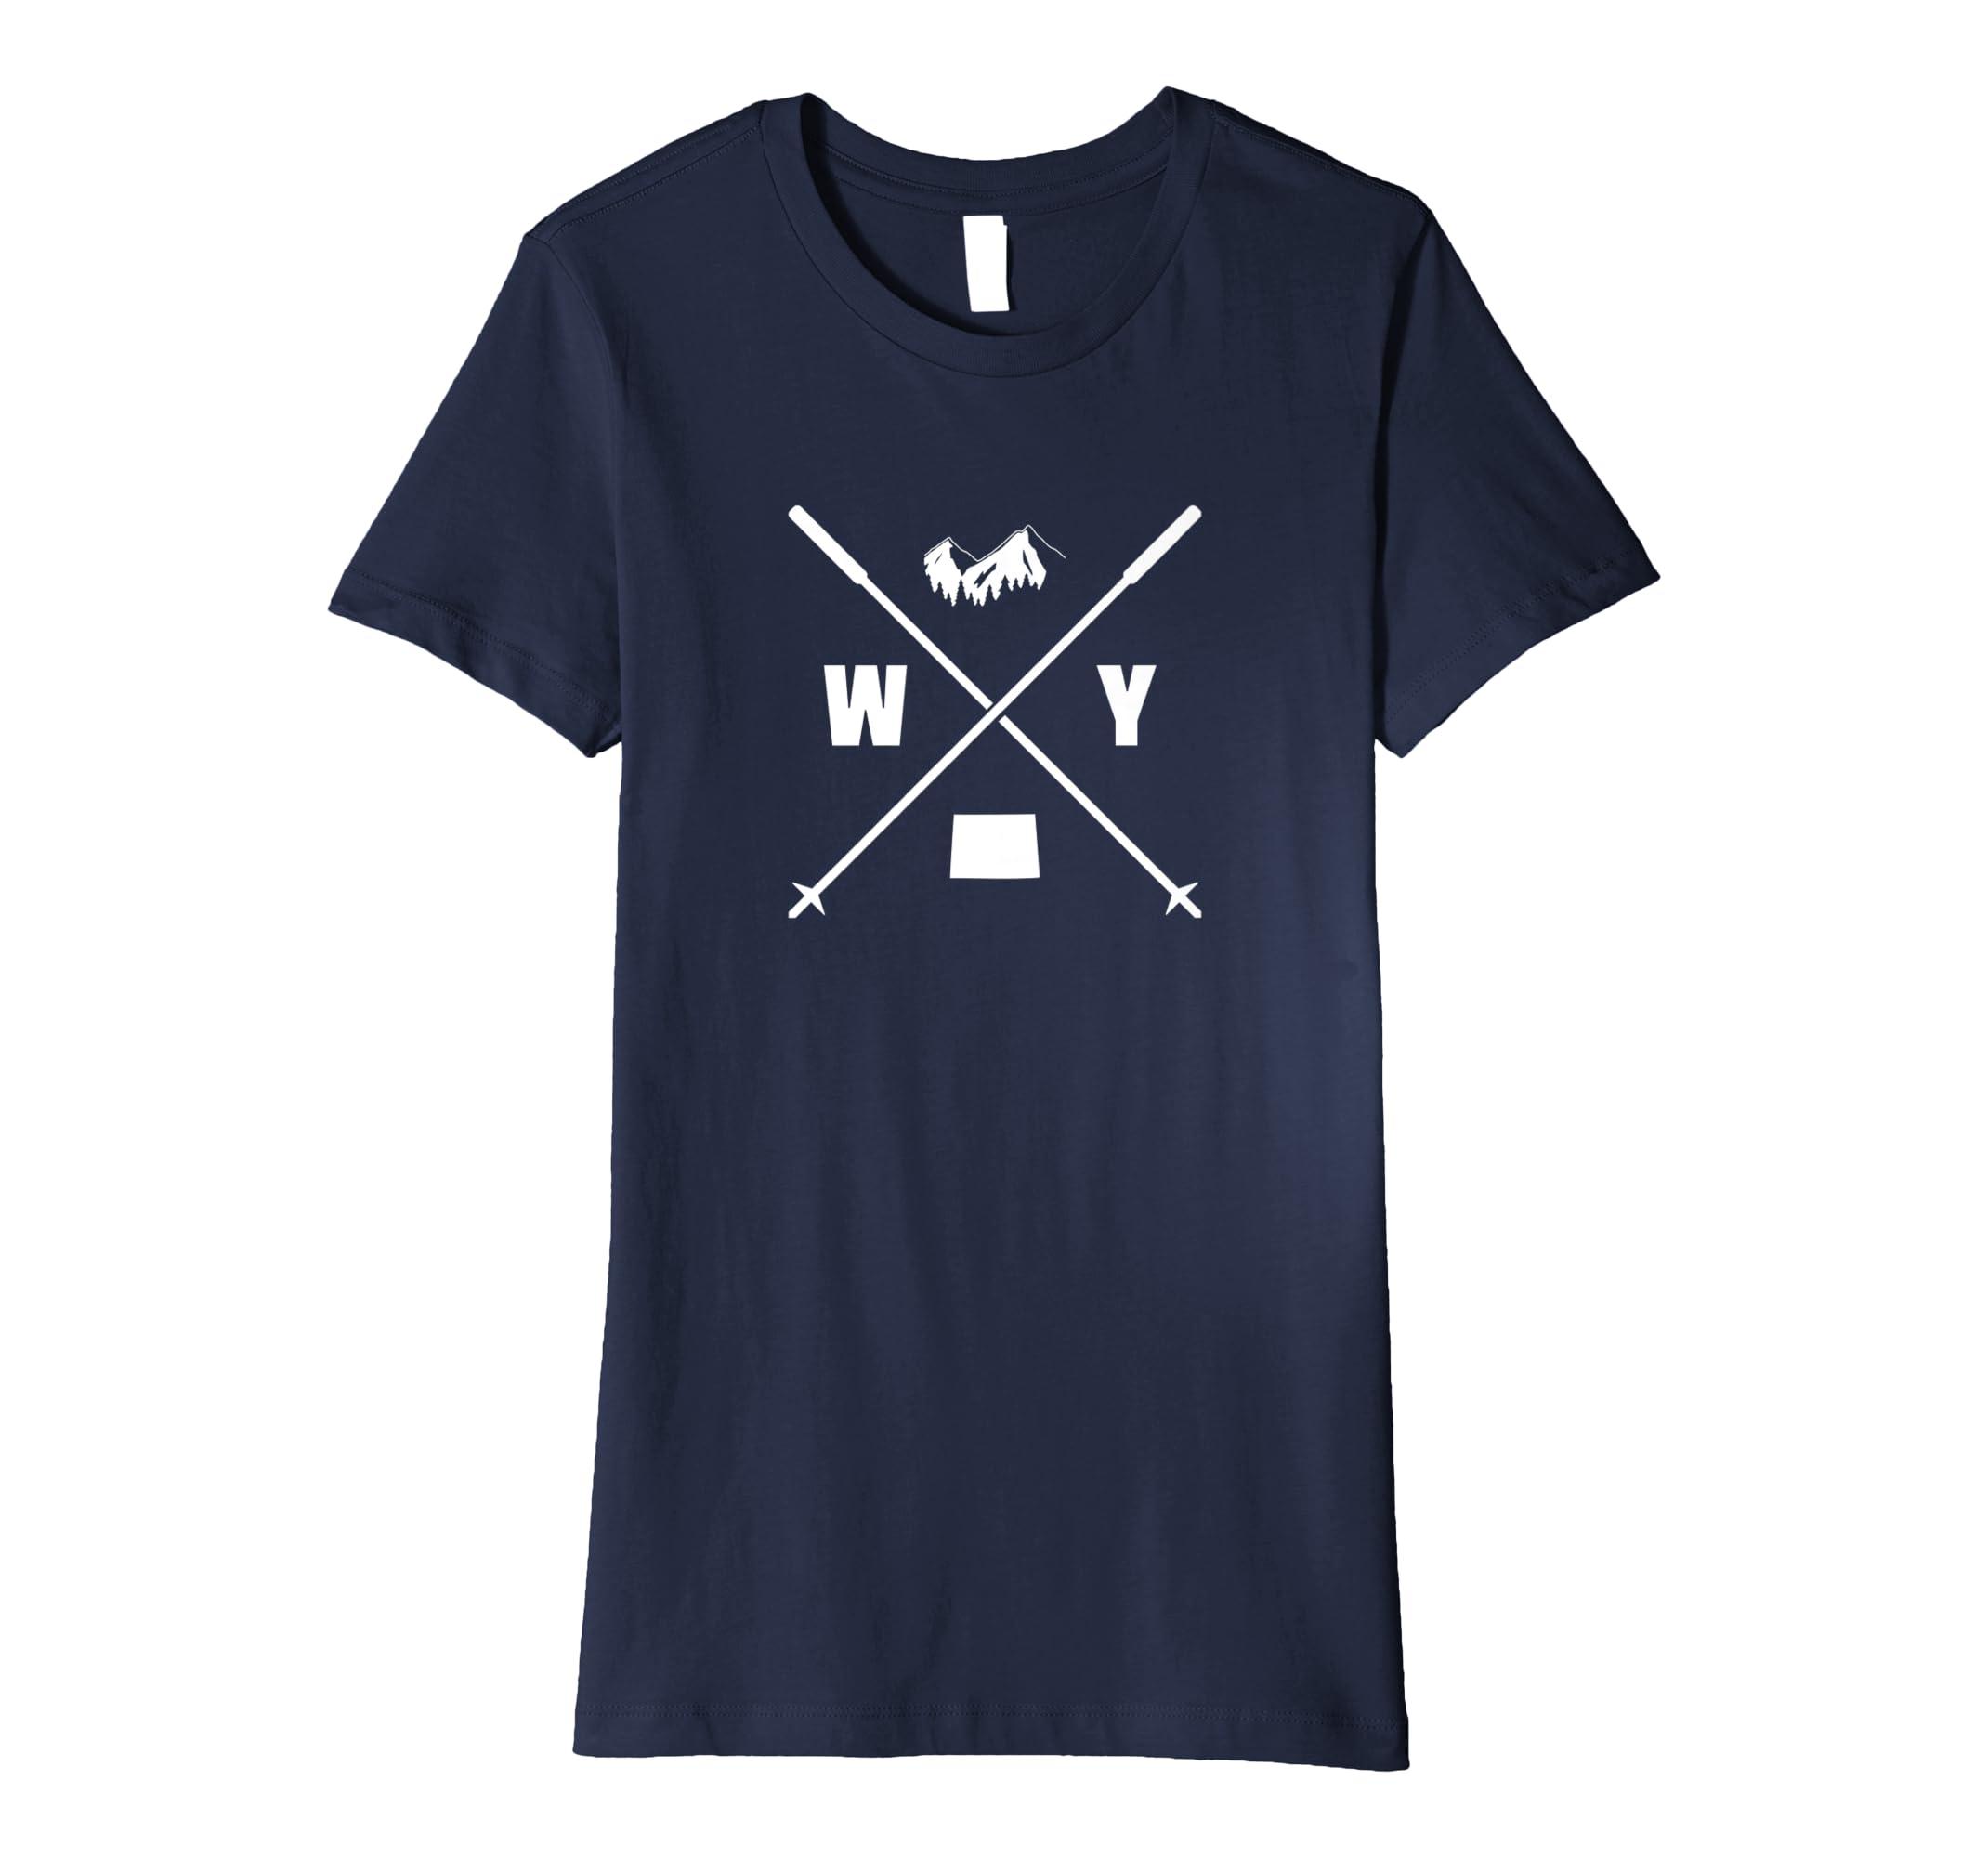 506bf062 Amazon.com: Ski Wyoming Slopes Vintage Skiing Mountains State Soft Shirt:  Clothing